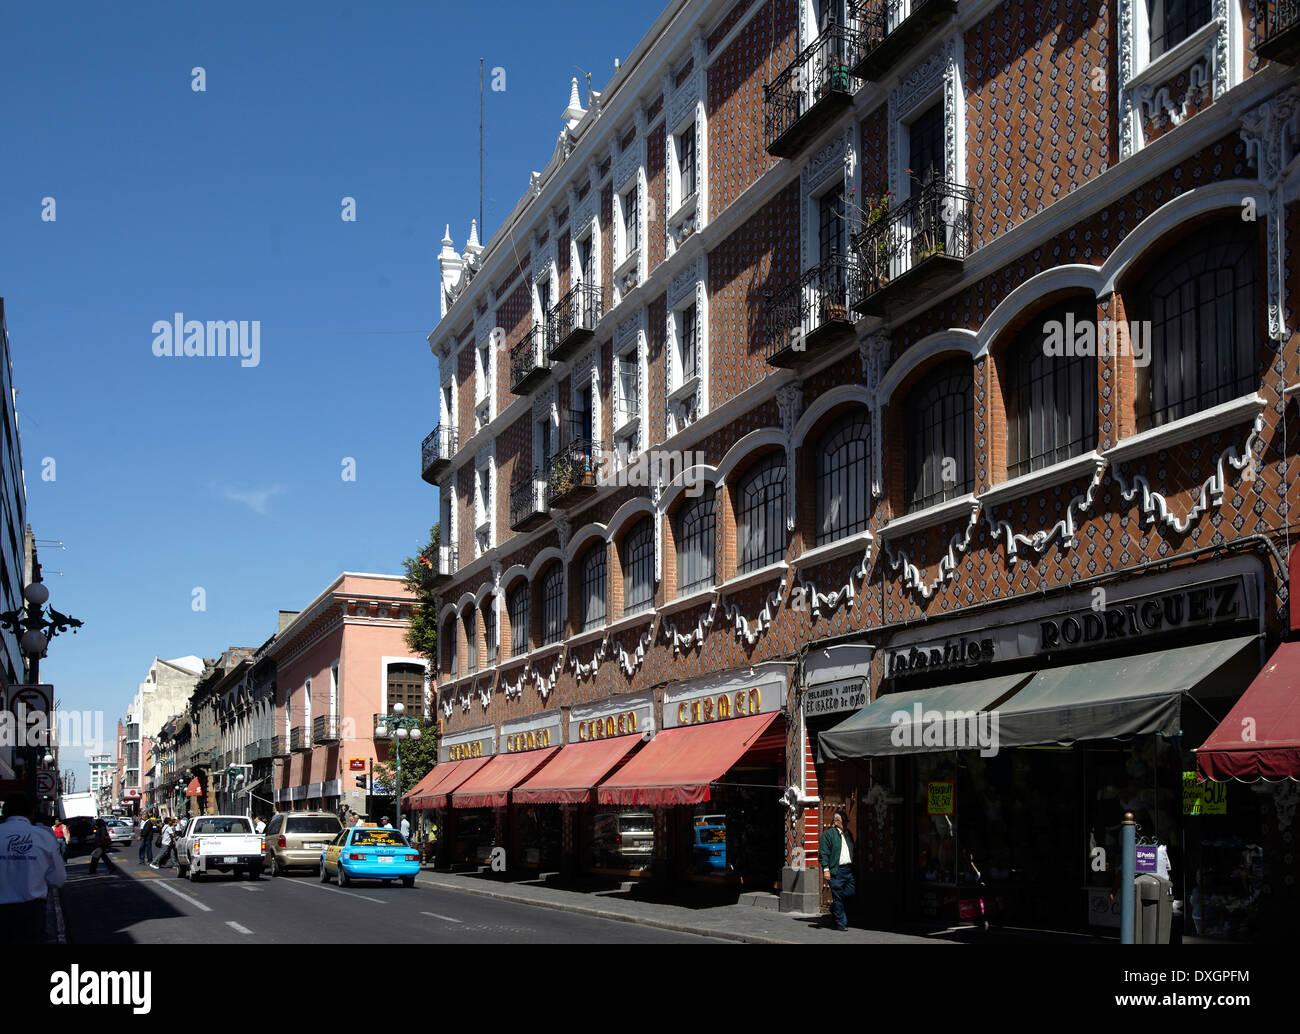 America, Mexico, Puebla state, Puebla city, Historical center, - Stock Image